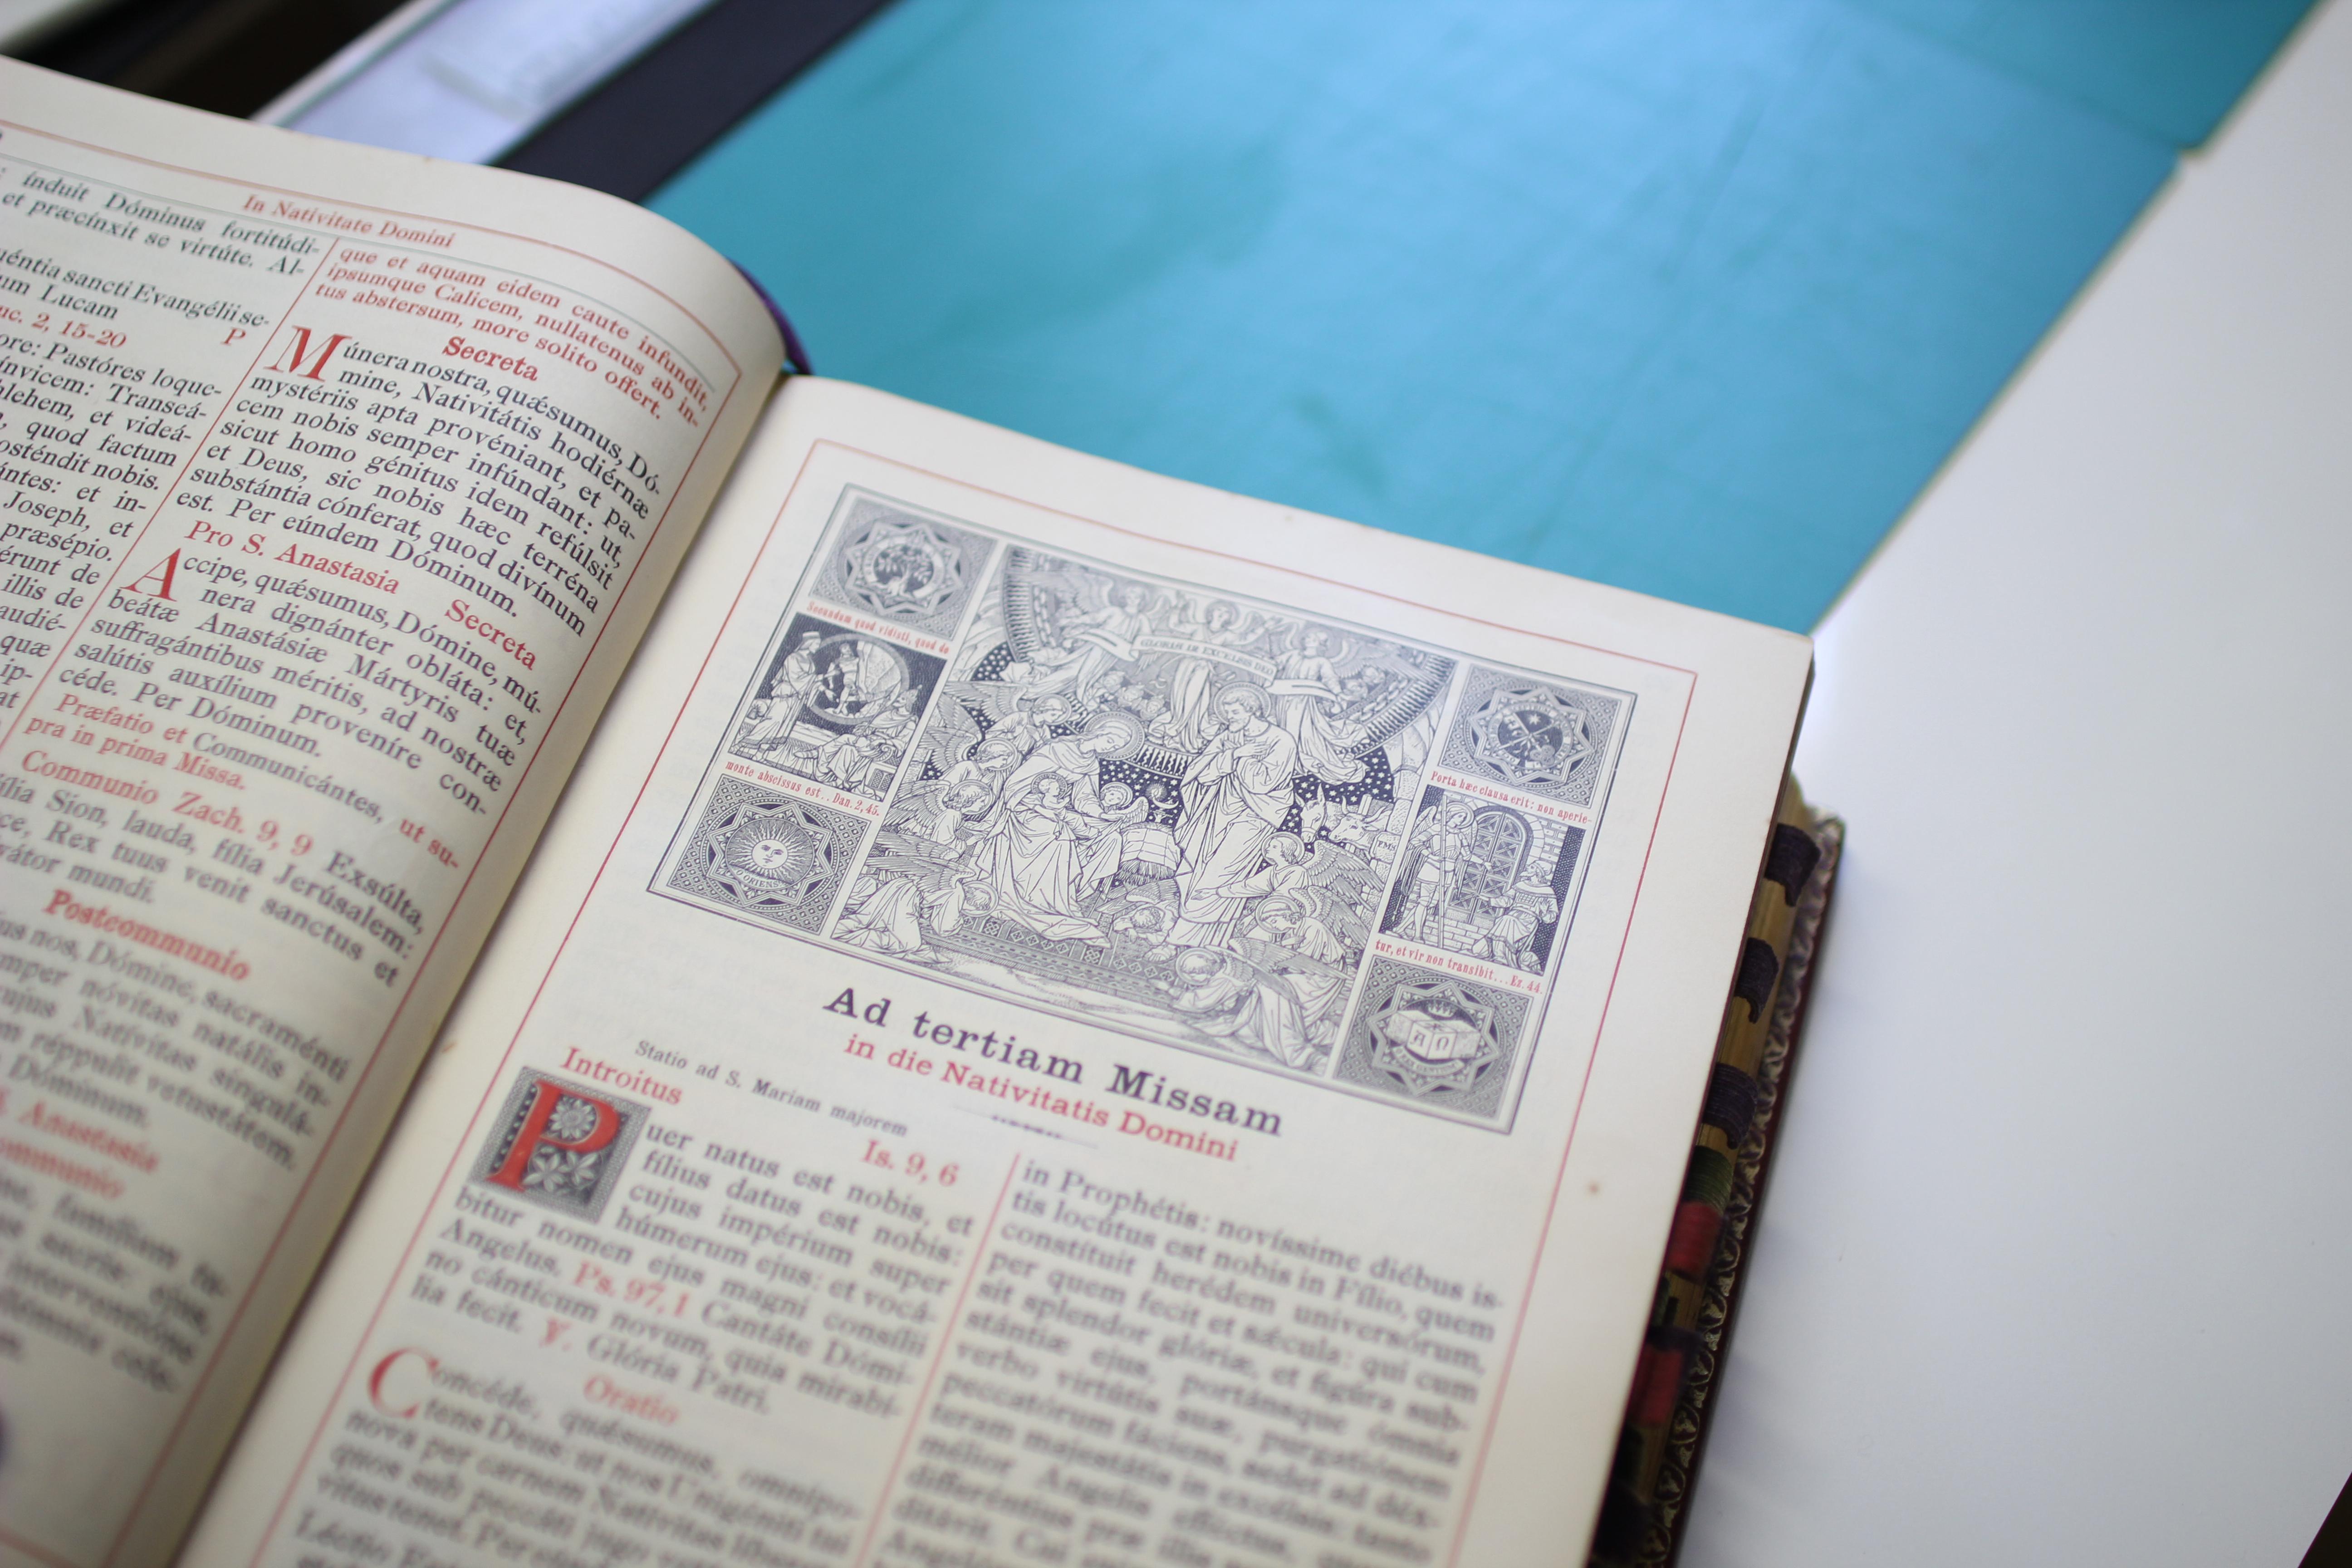 dos cistercienses